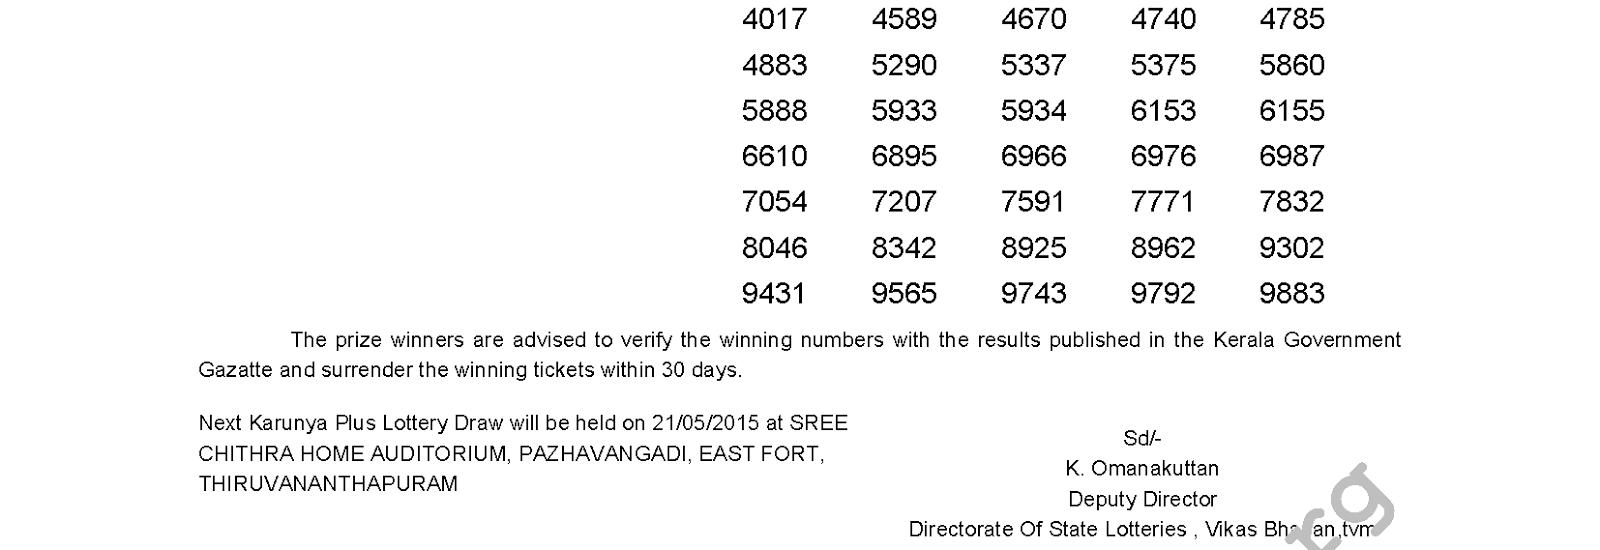 Karunya Plus Lottery KN 57 Result 14-5-2015